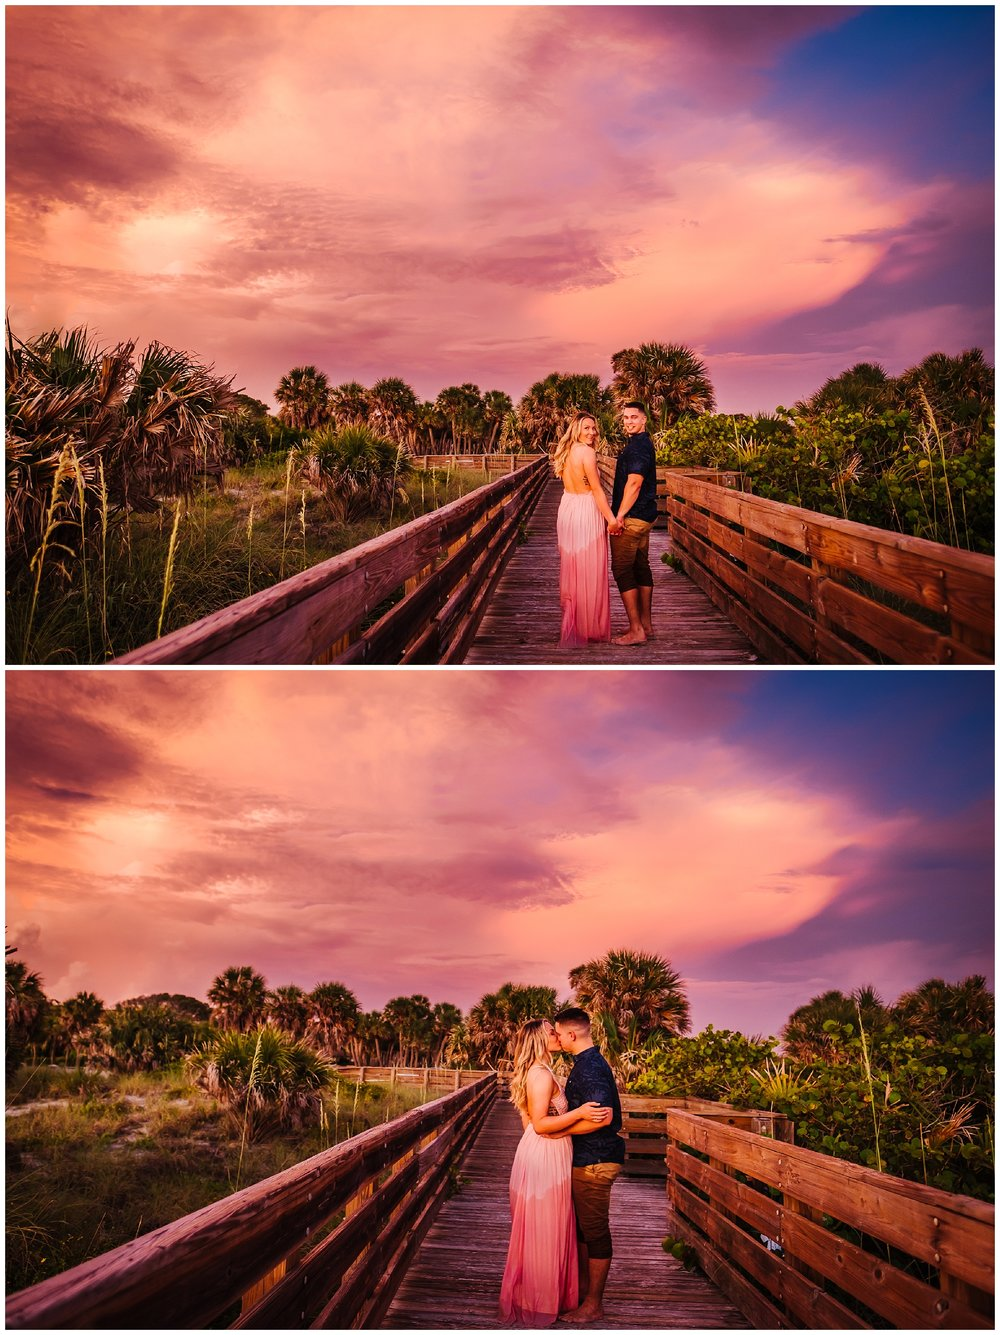 fort-desoto-engagement-photos-florida-beach-sunset_0253.jpg